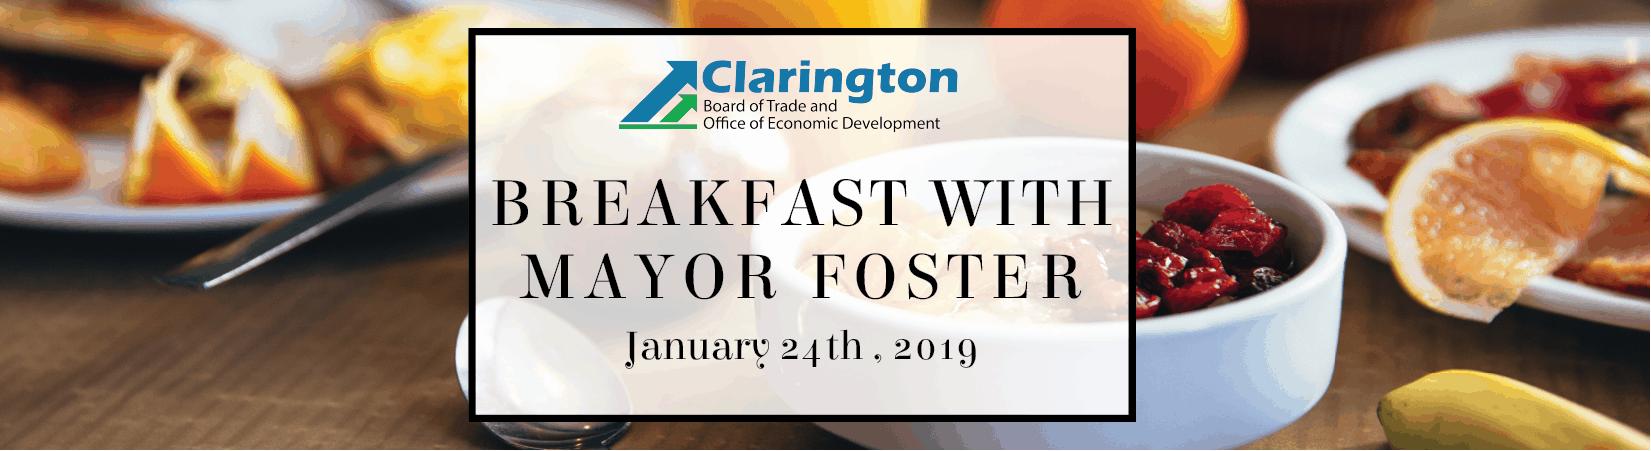 Breakfast with Mayor Foster